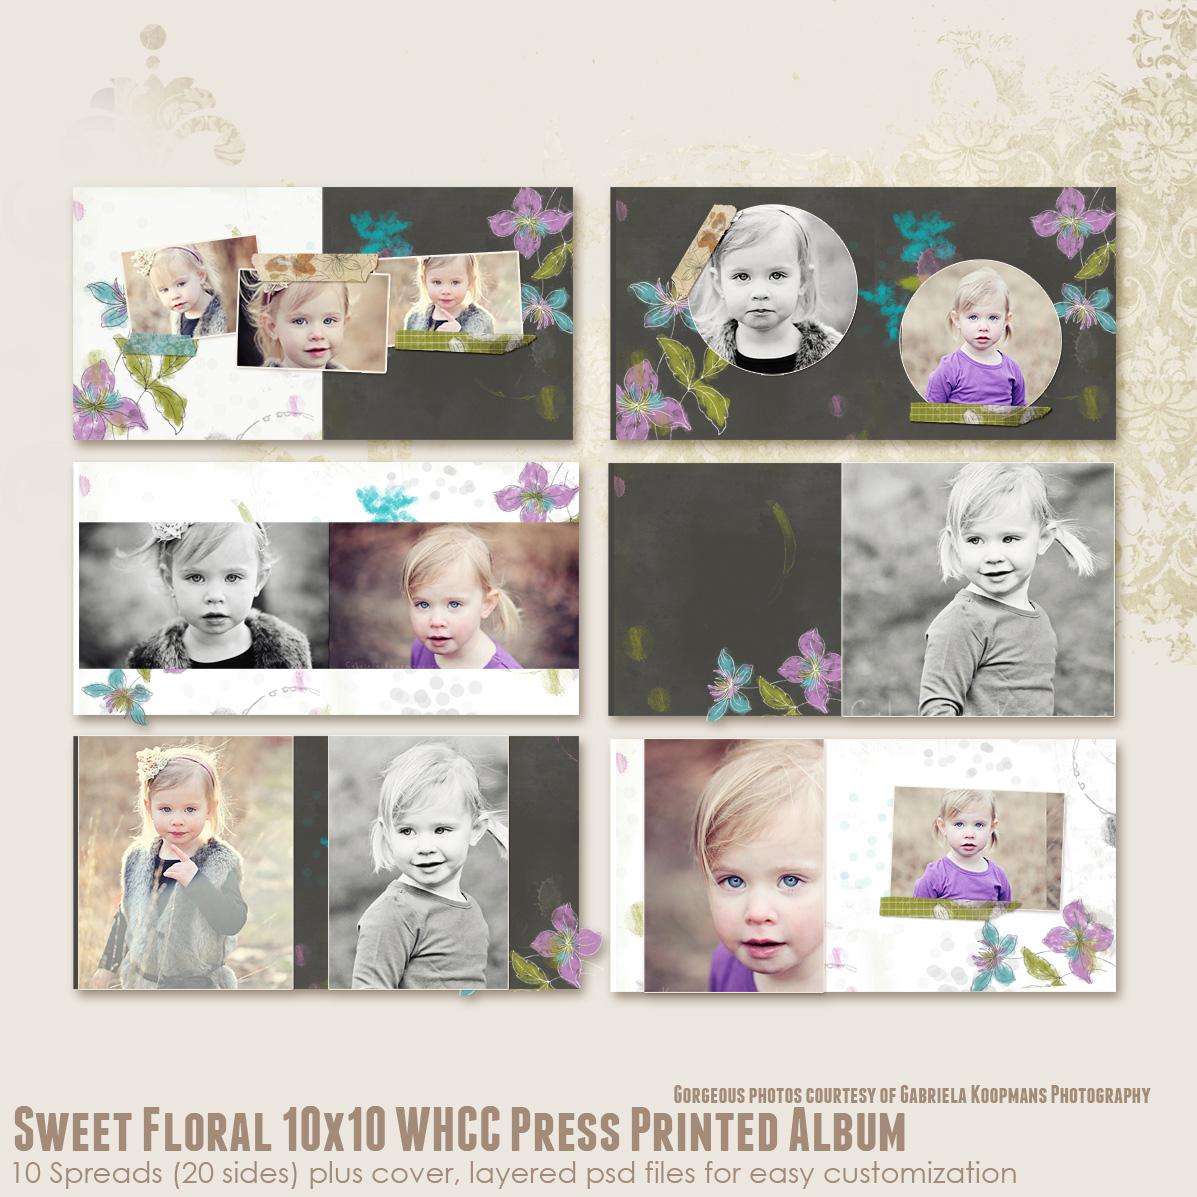 Printed Album: Sweet Floral 10x10 WHCC Press Printed Album [albums